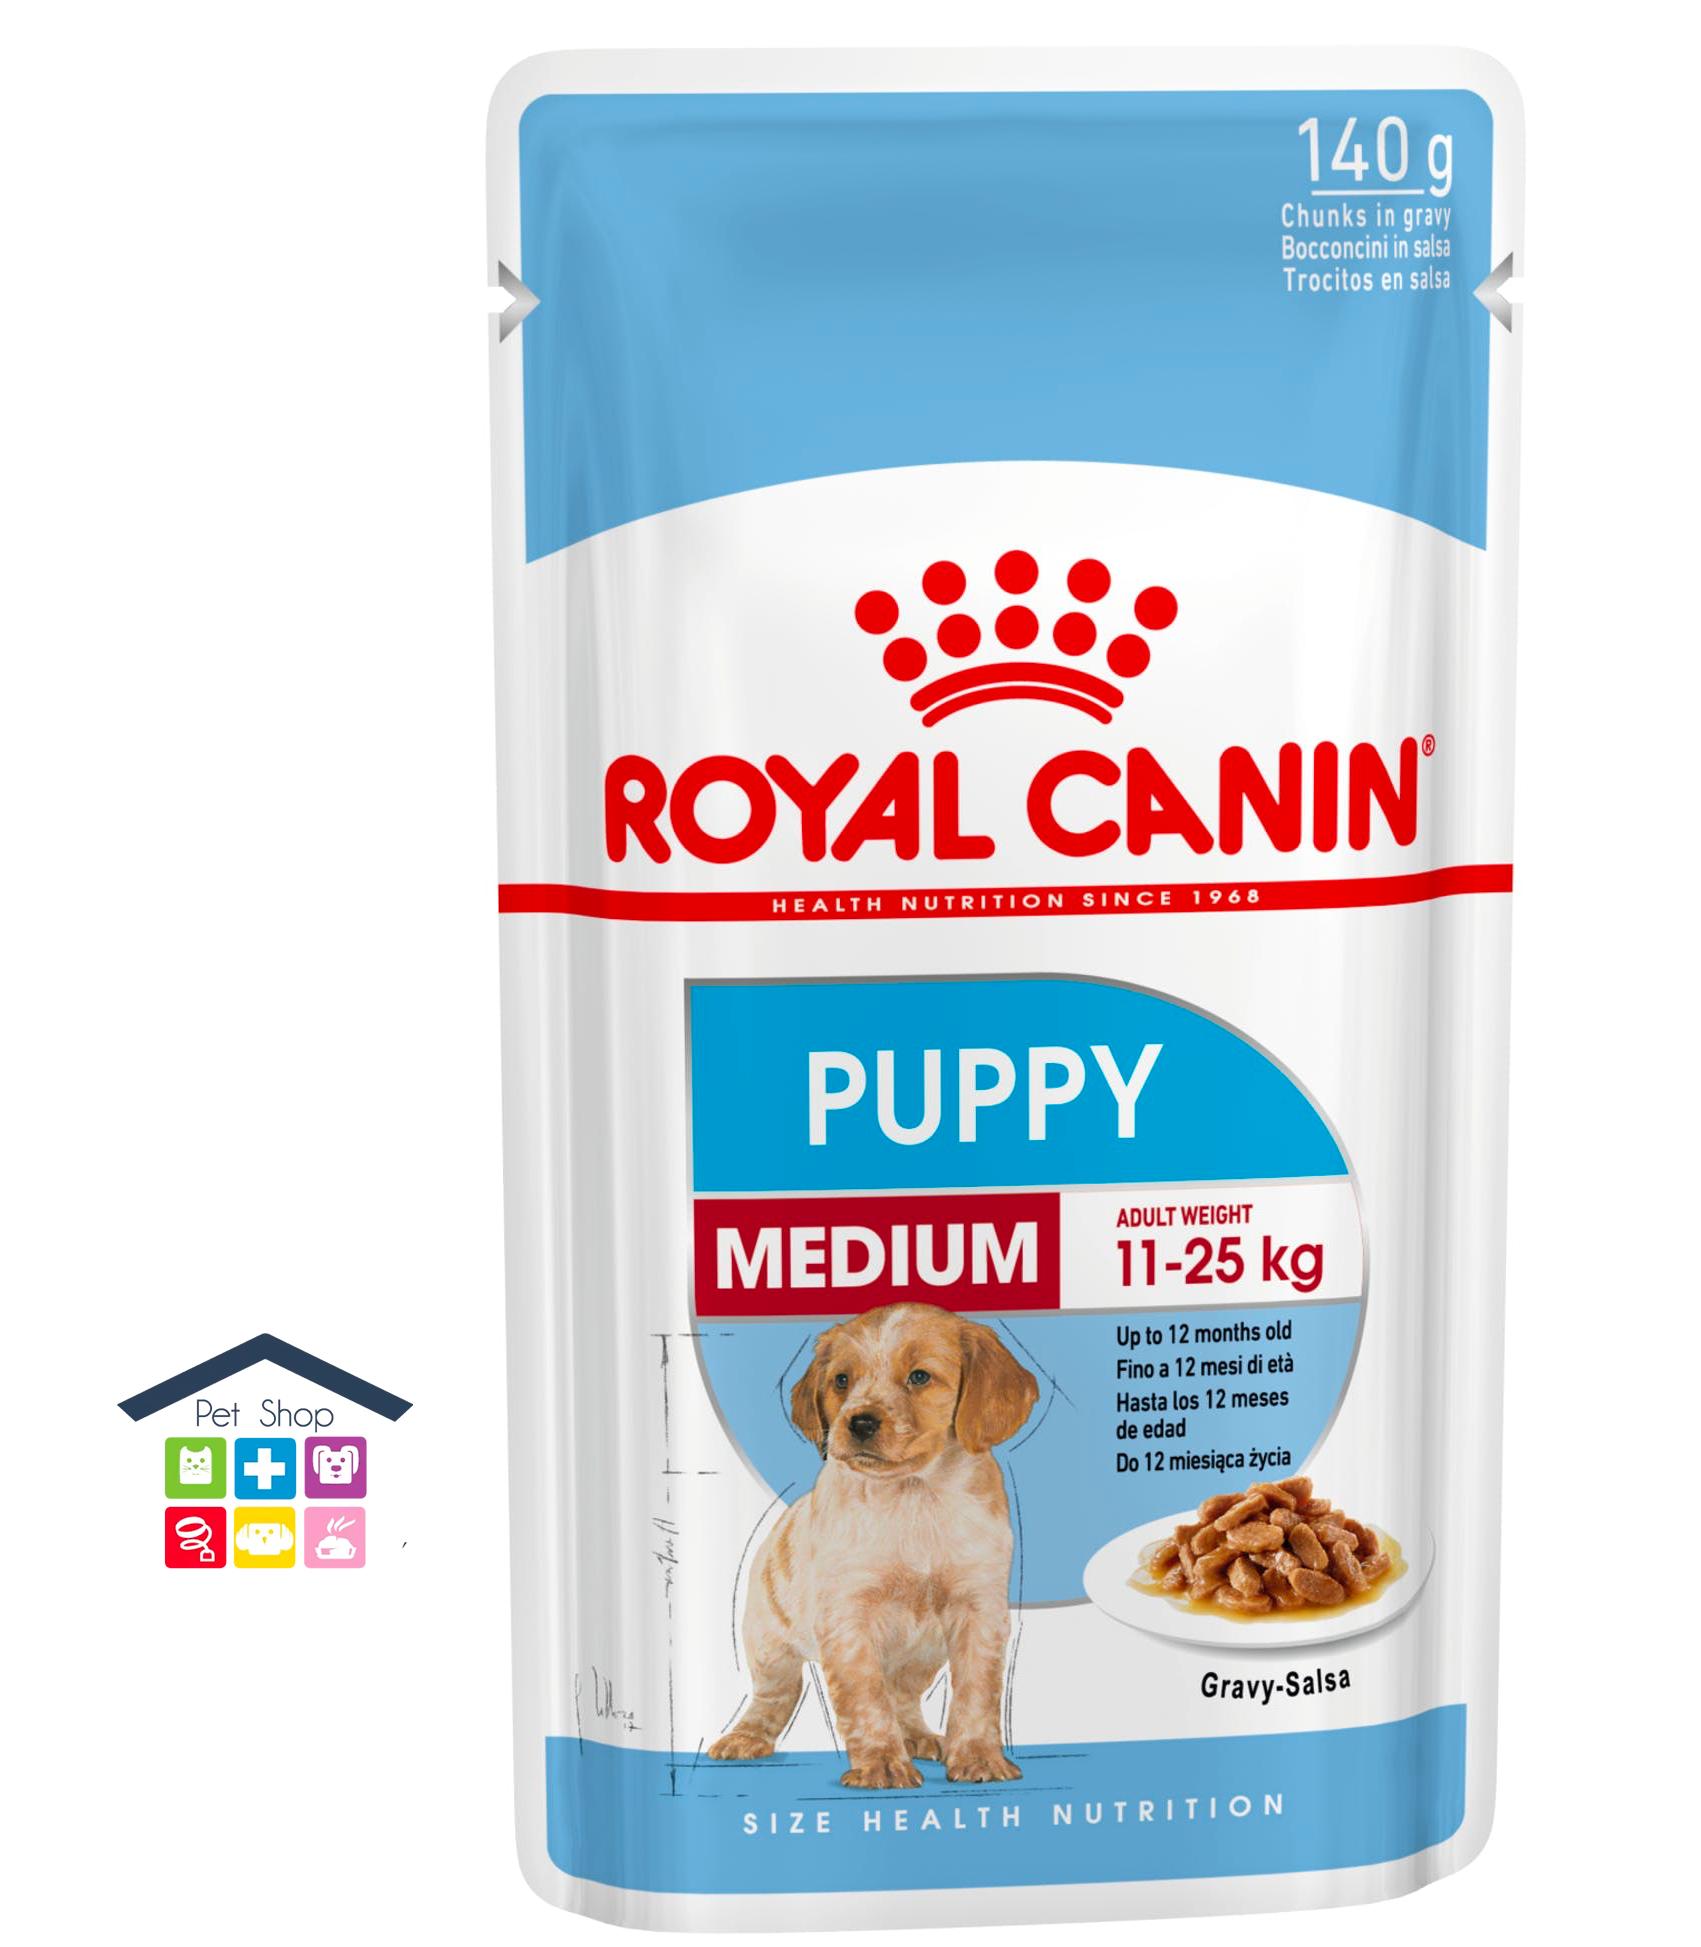 Royal Canin Cane   Linea Size HN   MEDIUM Puppy 140g Bustina